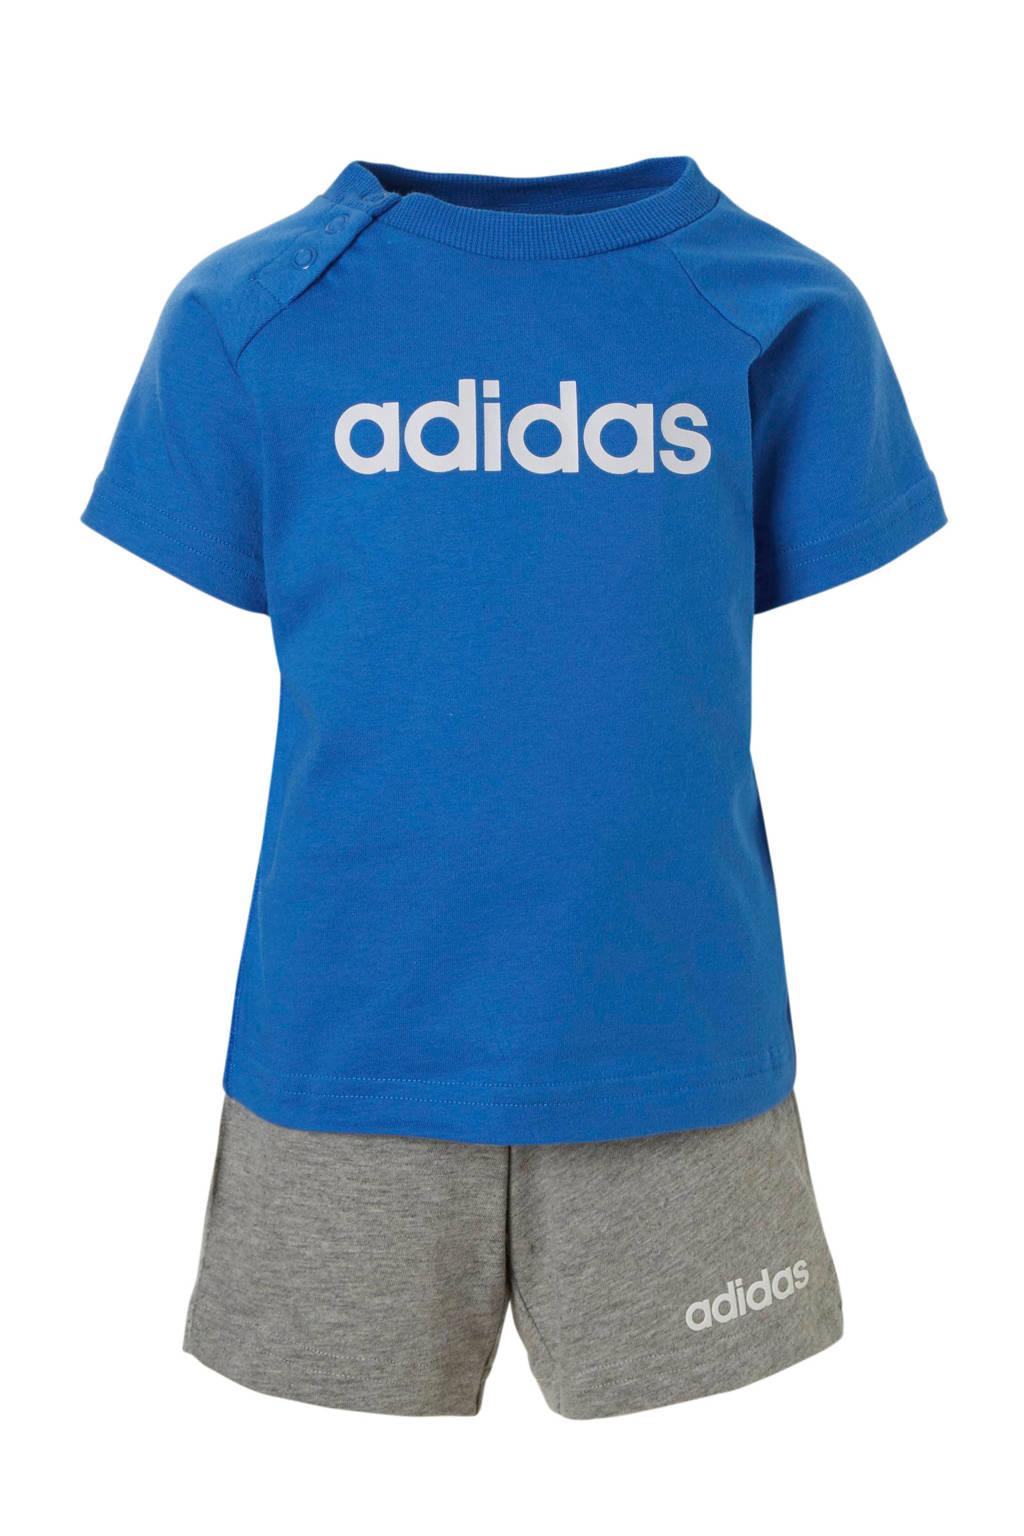 adidas performance T-shirt en short blauw/grijs, Blauw/grijs